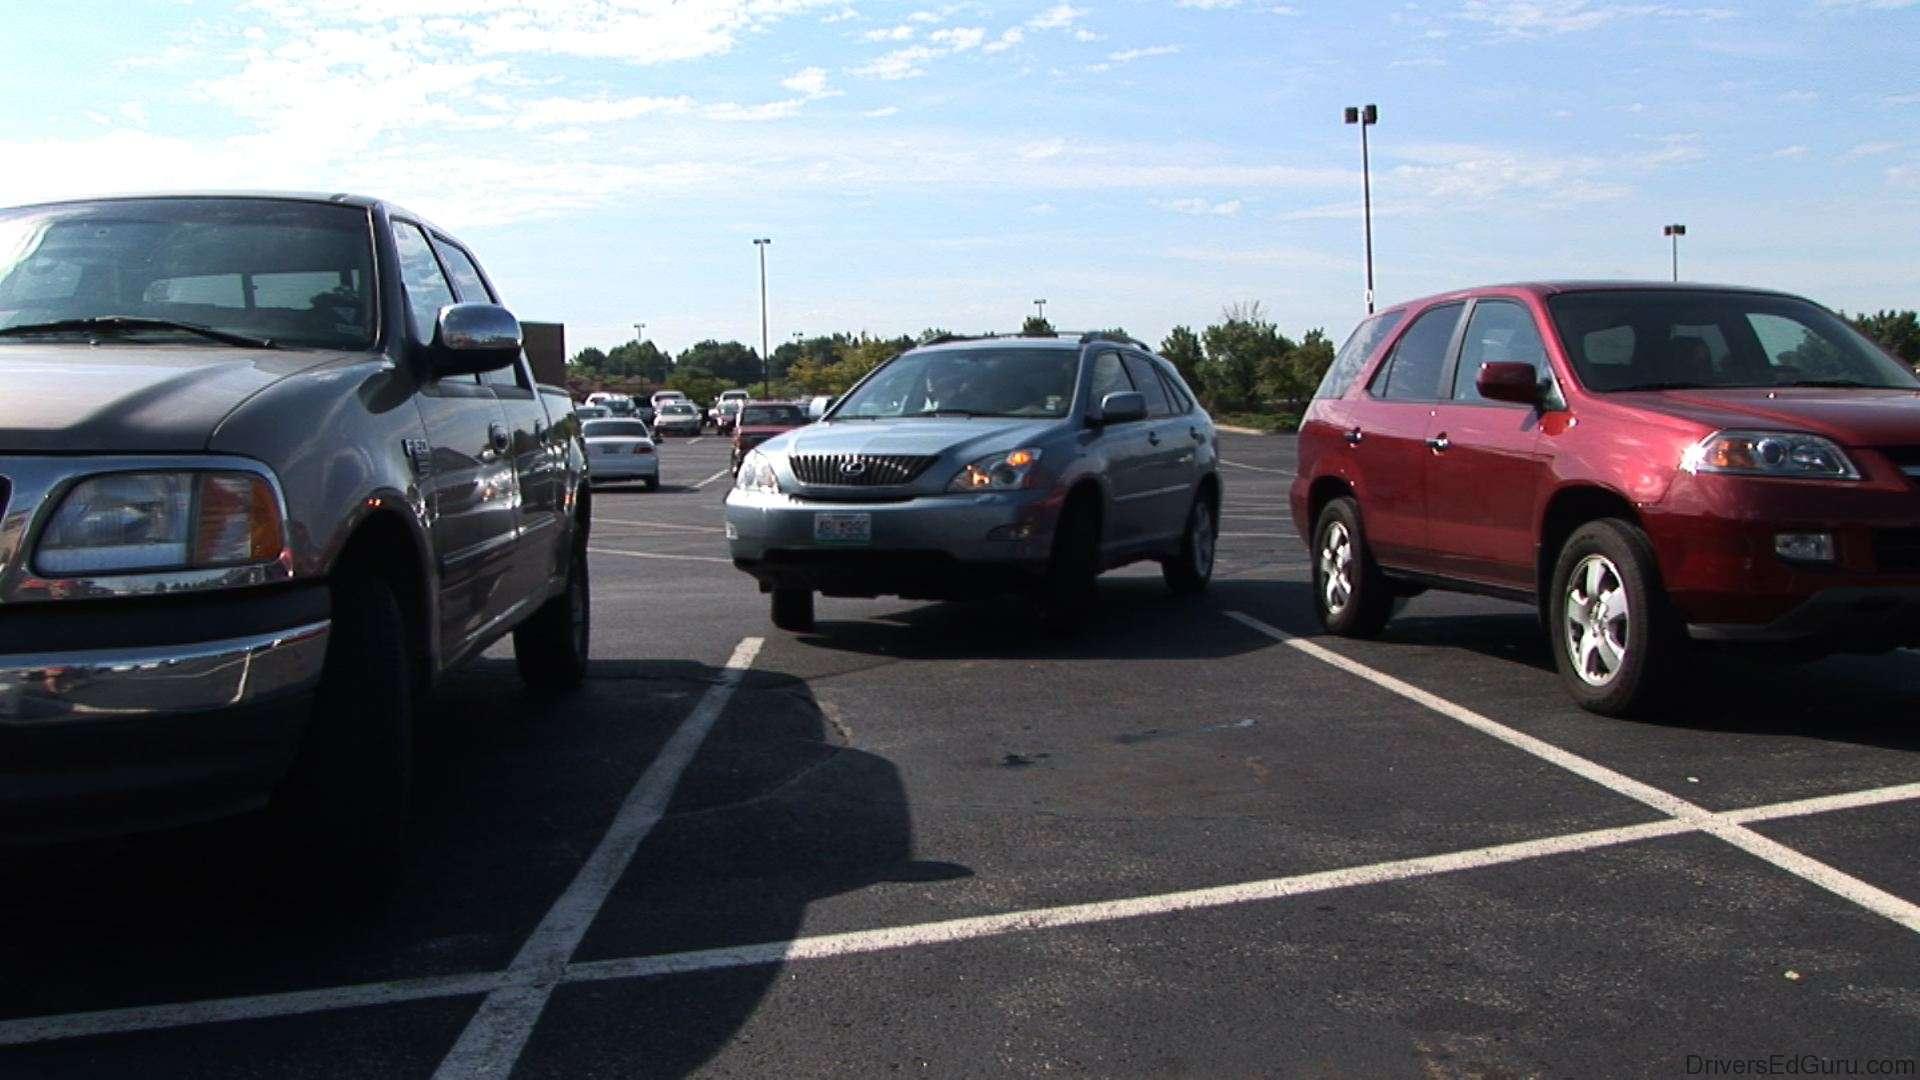 parking-56.jpg